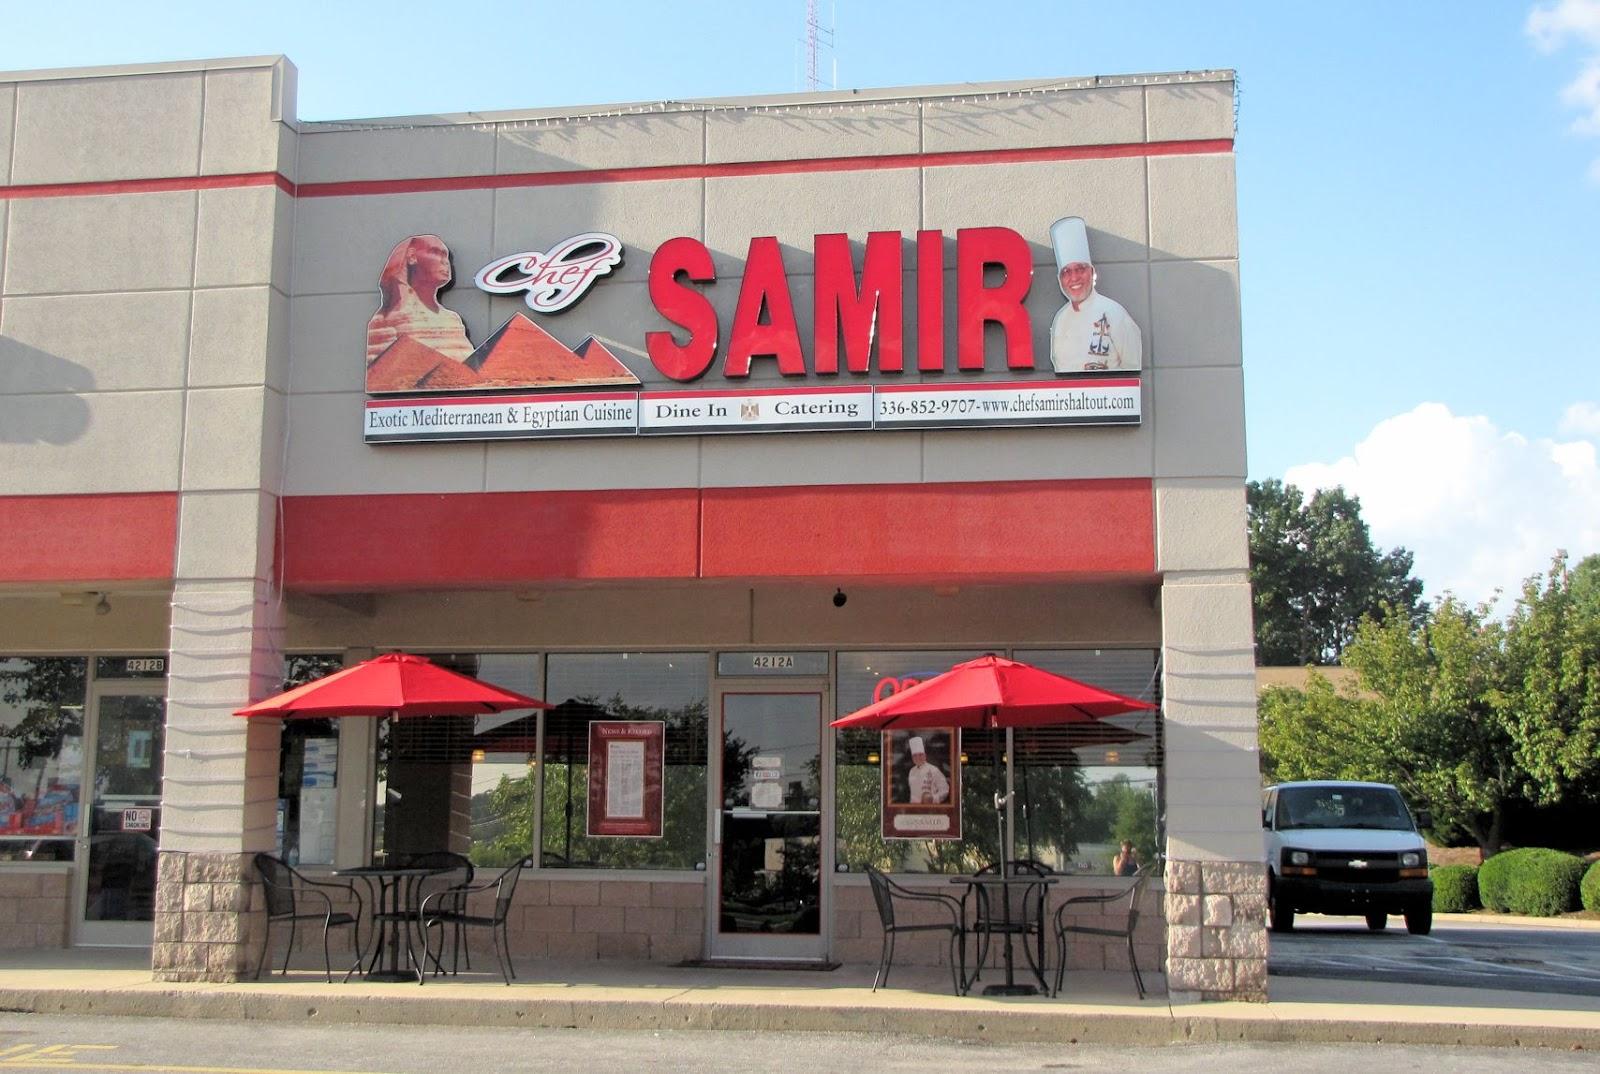 Fine dining restaurant exterior - Unassuming From The Exterior